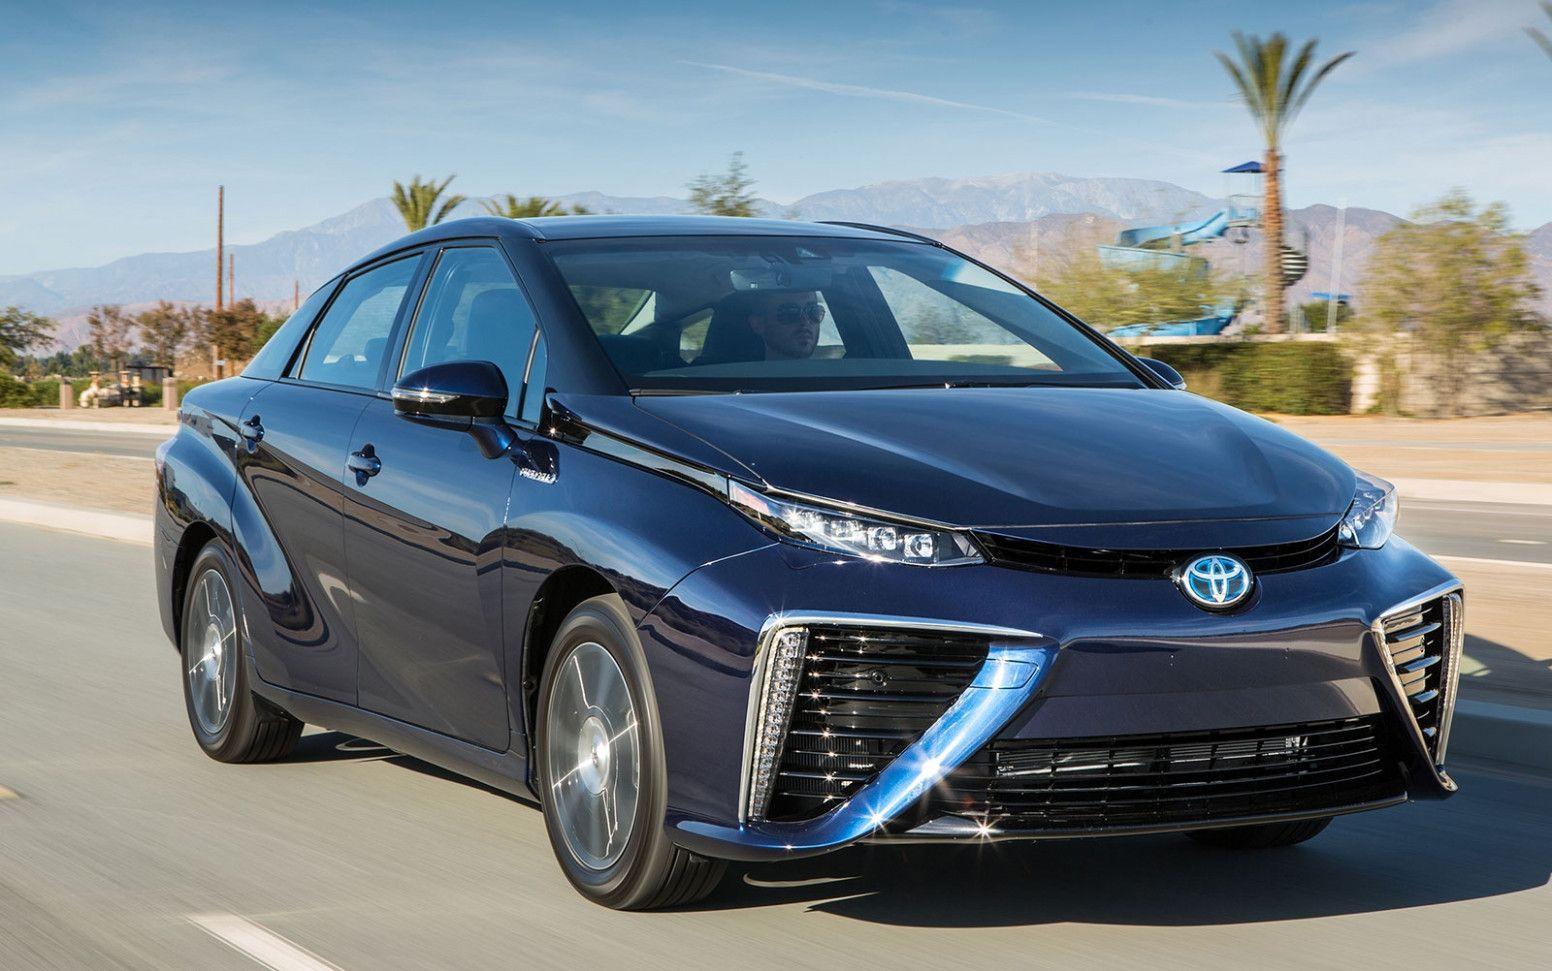 2020 Toyota Vios in 2020 Hydrogen car, Fuel cell, Toyota